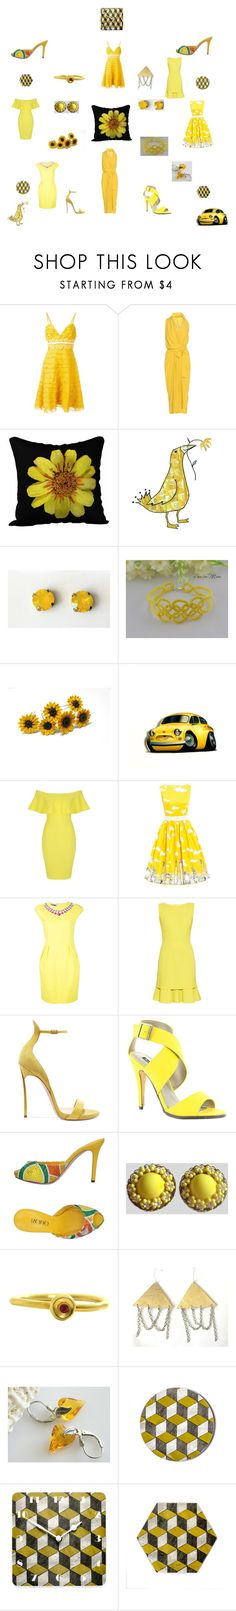 """Yellow Dresses Summertime"" by einder ❤ liked on Polyvore featuring Giambattista Valli, Rick Owens, Giallo, Jane Norman, Moschino, Oscar de la Renta, Casadei, Michael Antonio and Rodo"